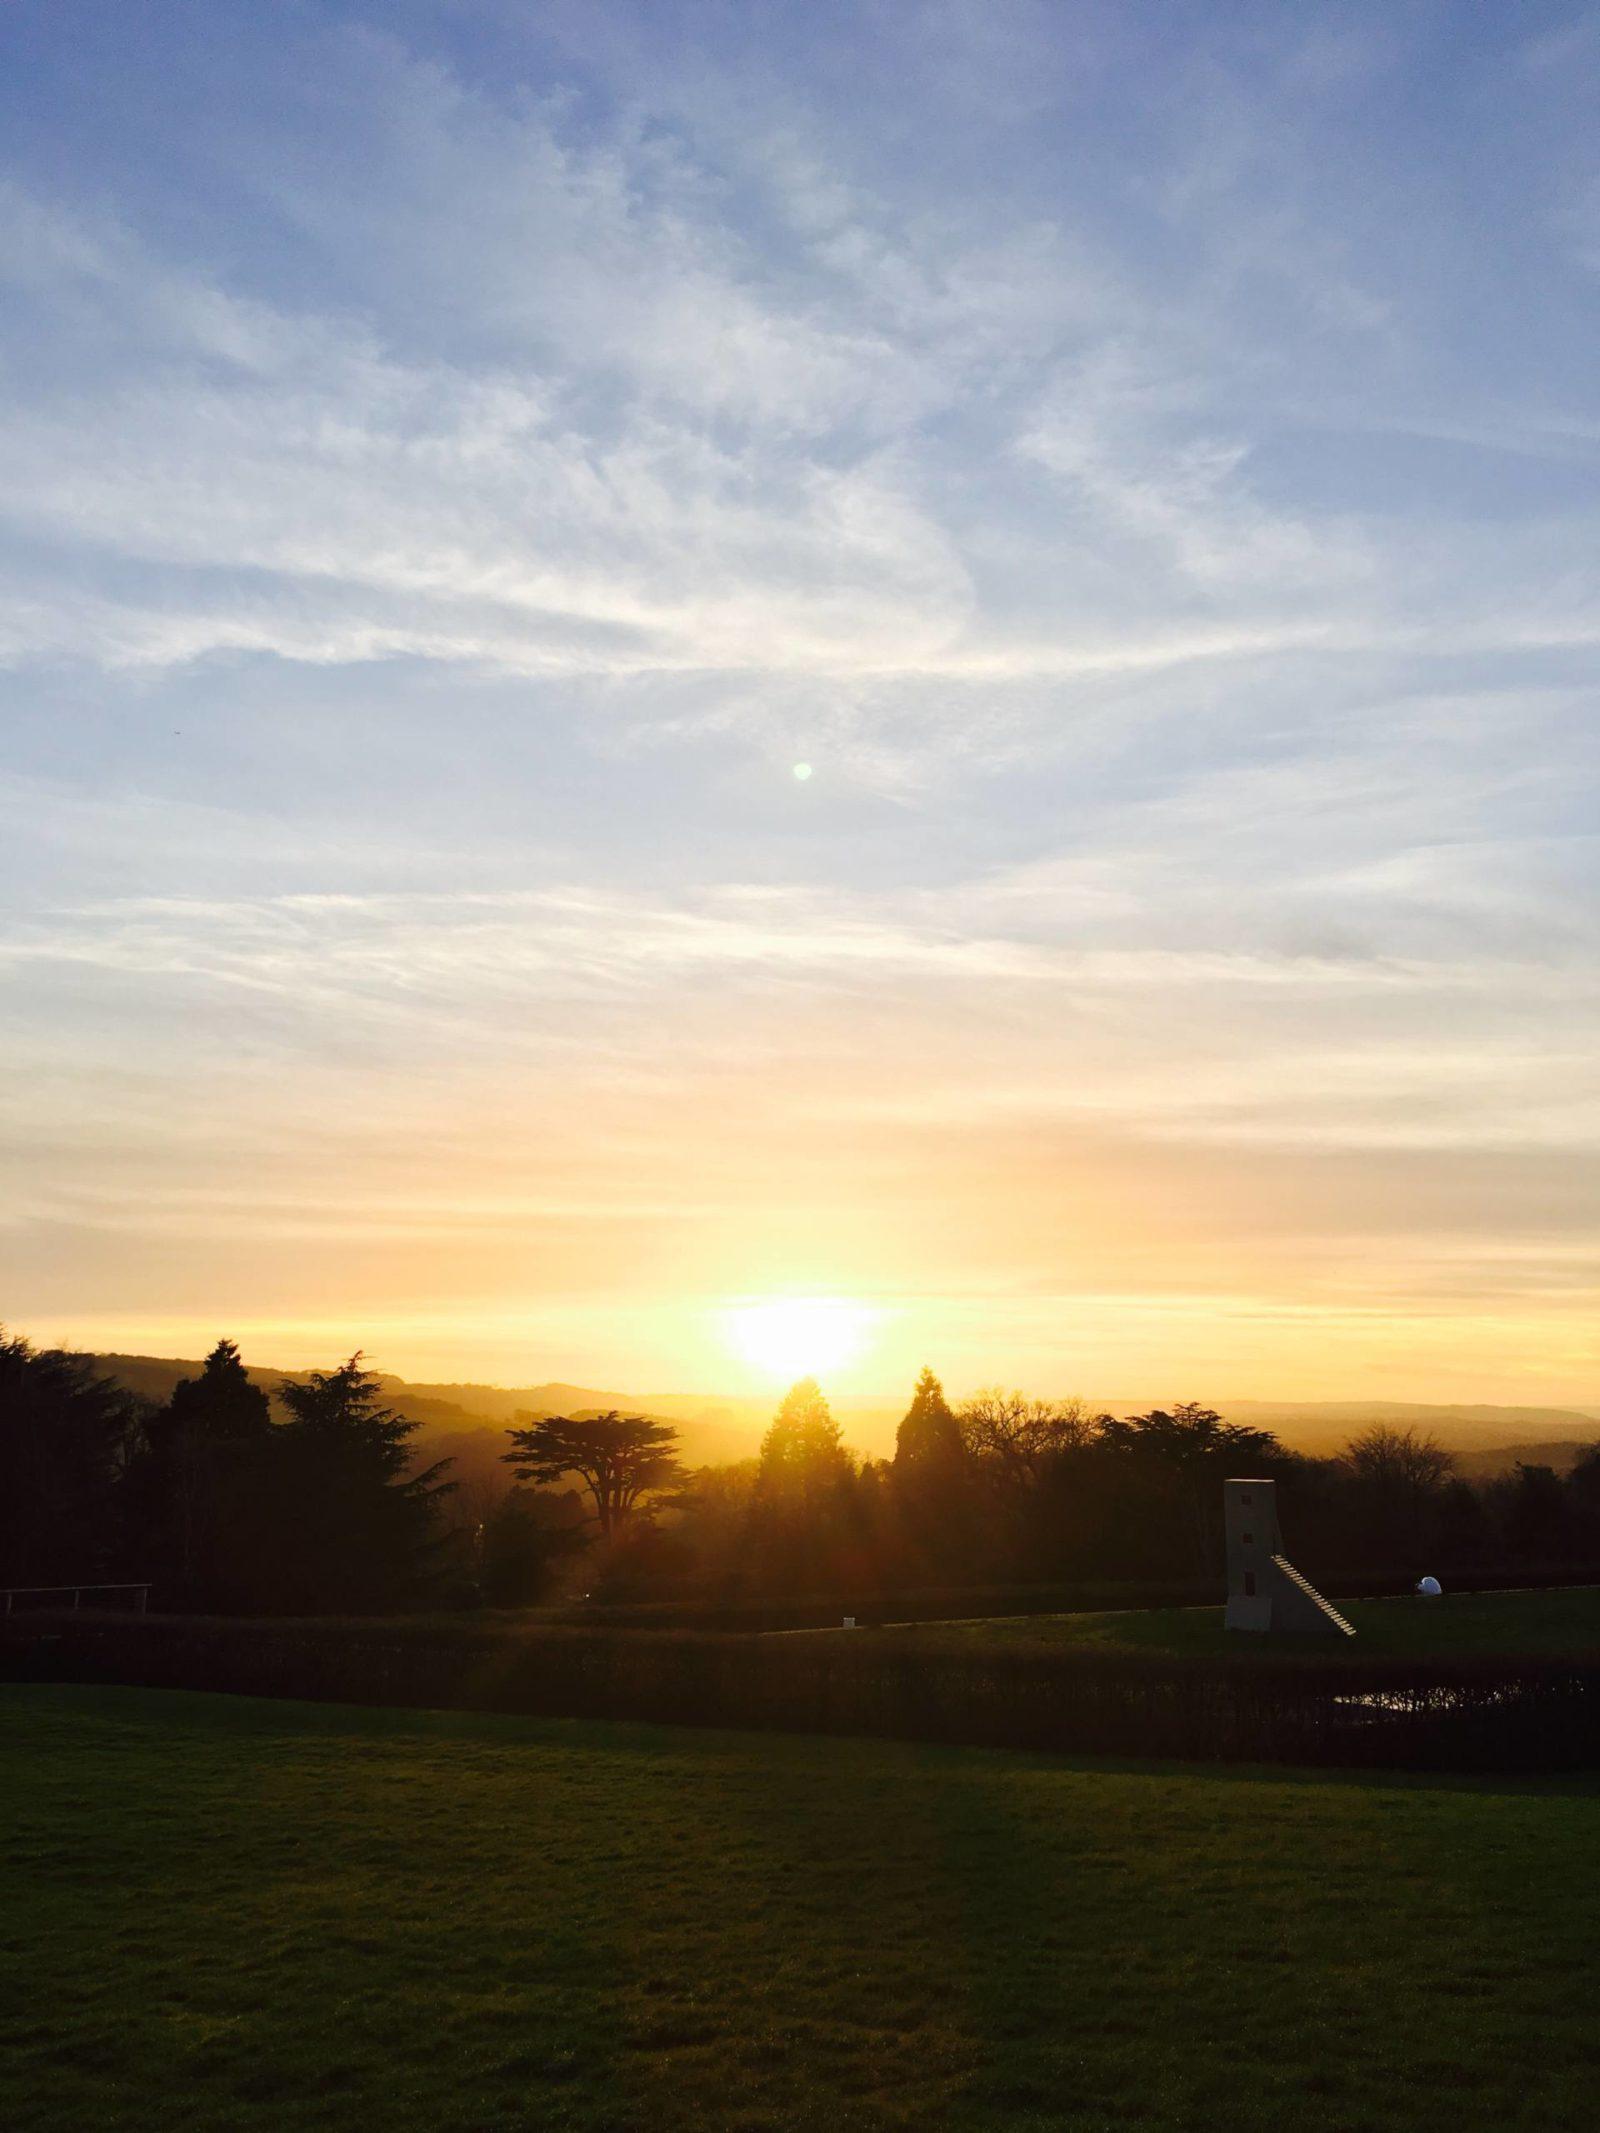 sunset at yorkshire sculpture park